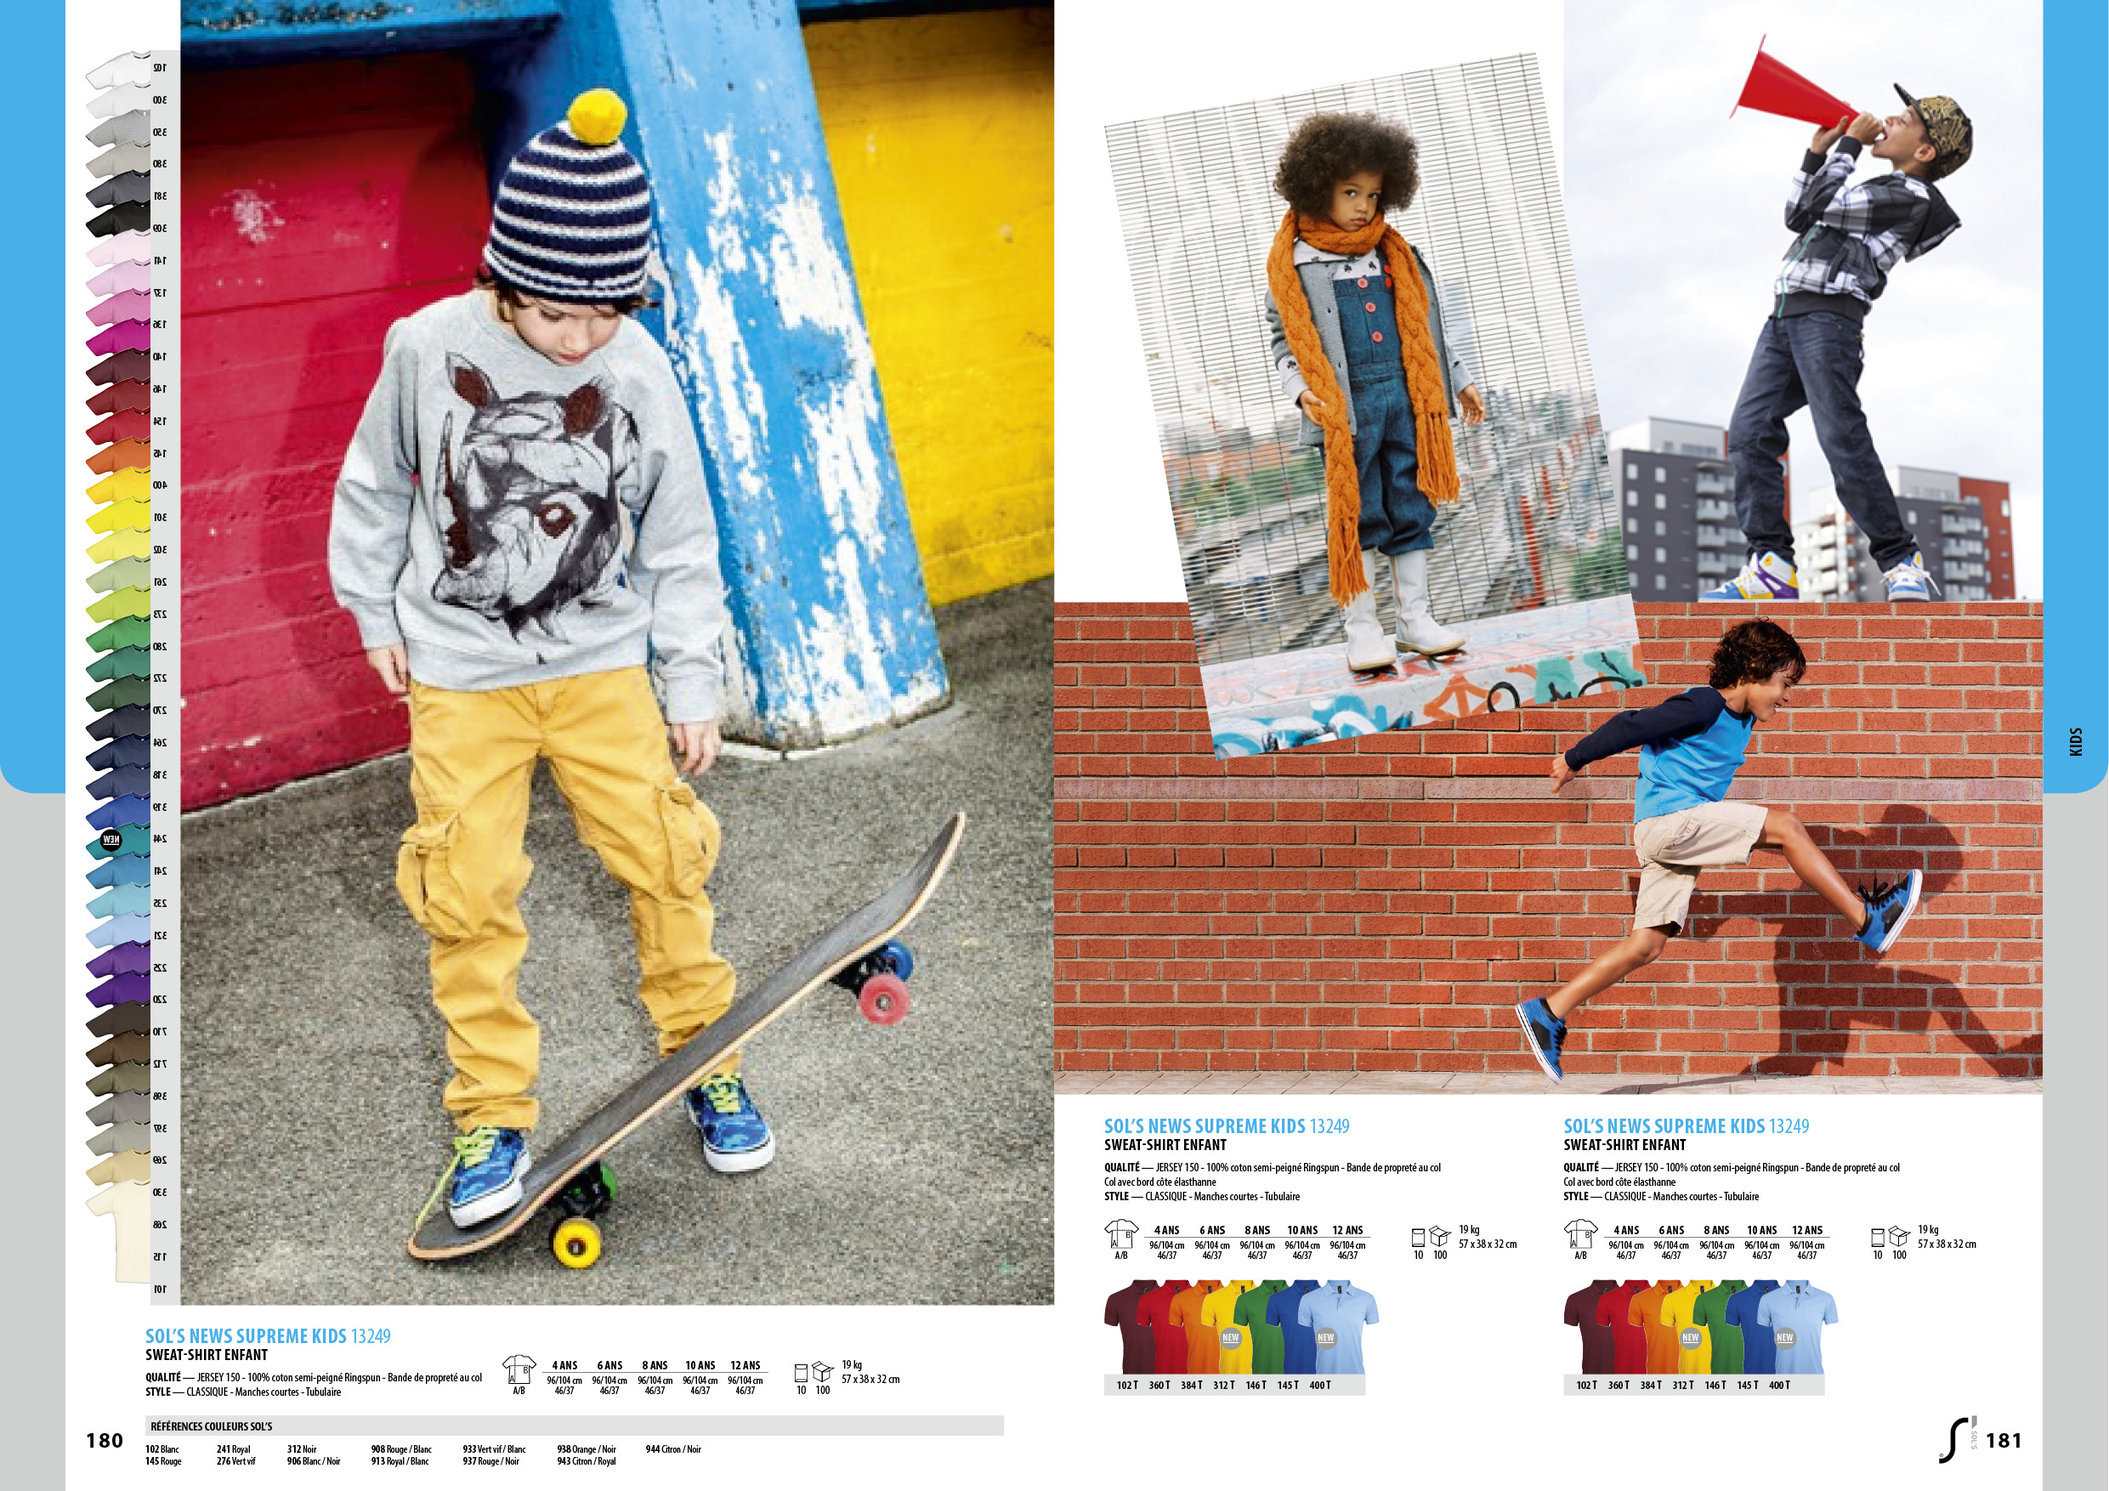 "<font color=""#aaa7a6"">Catalogue, maquette - Axe 1 (3/7).</font>"